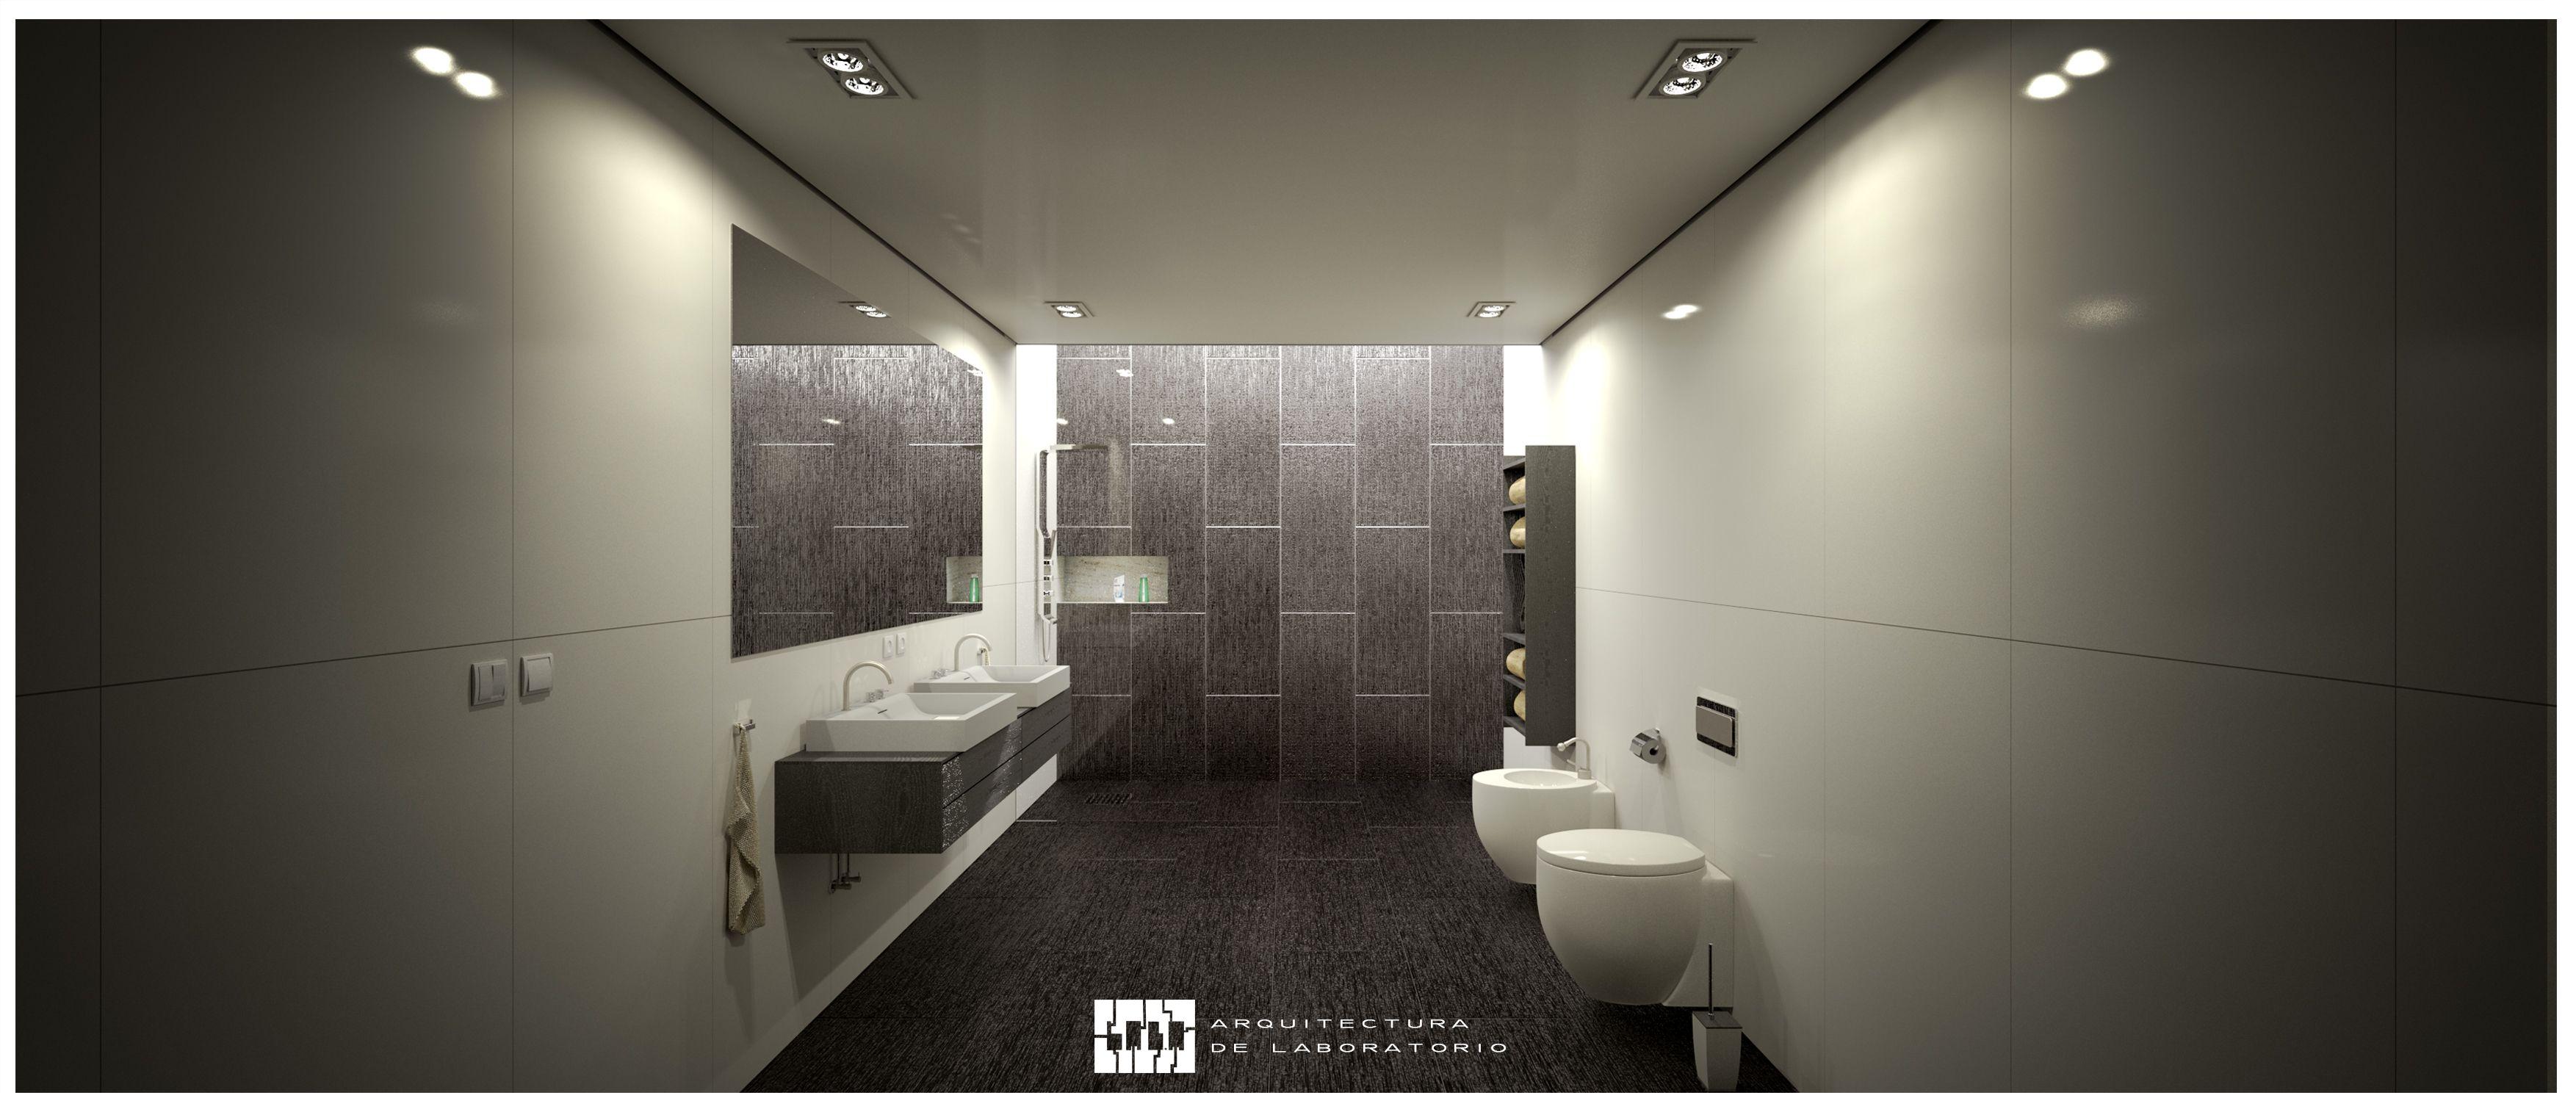 LAB.A # 006 Bathroom Less